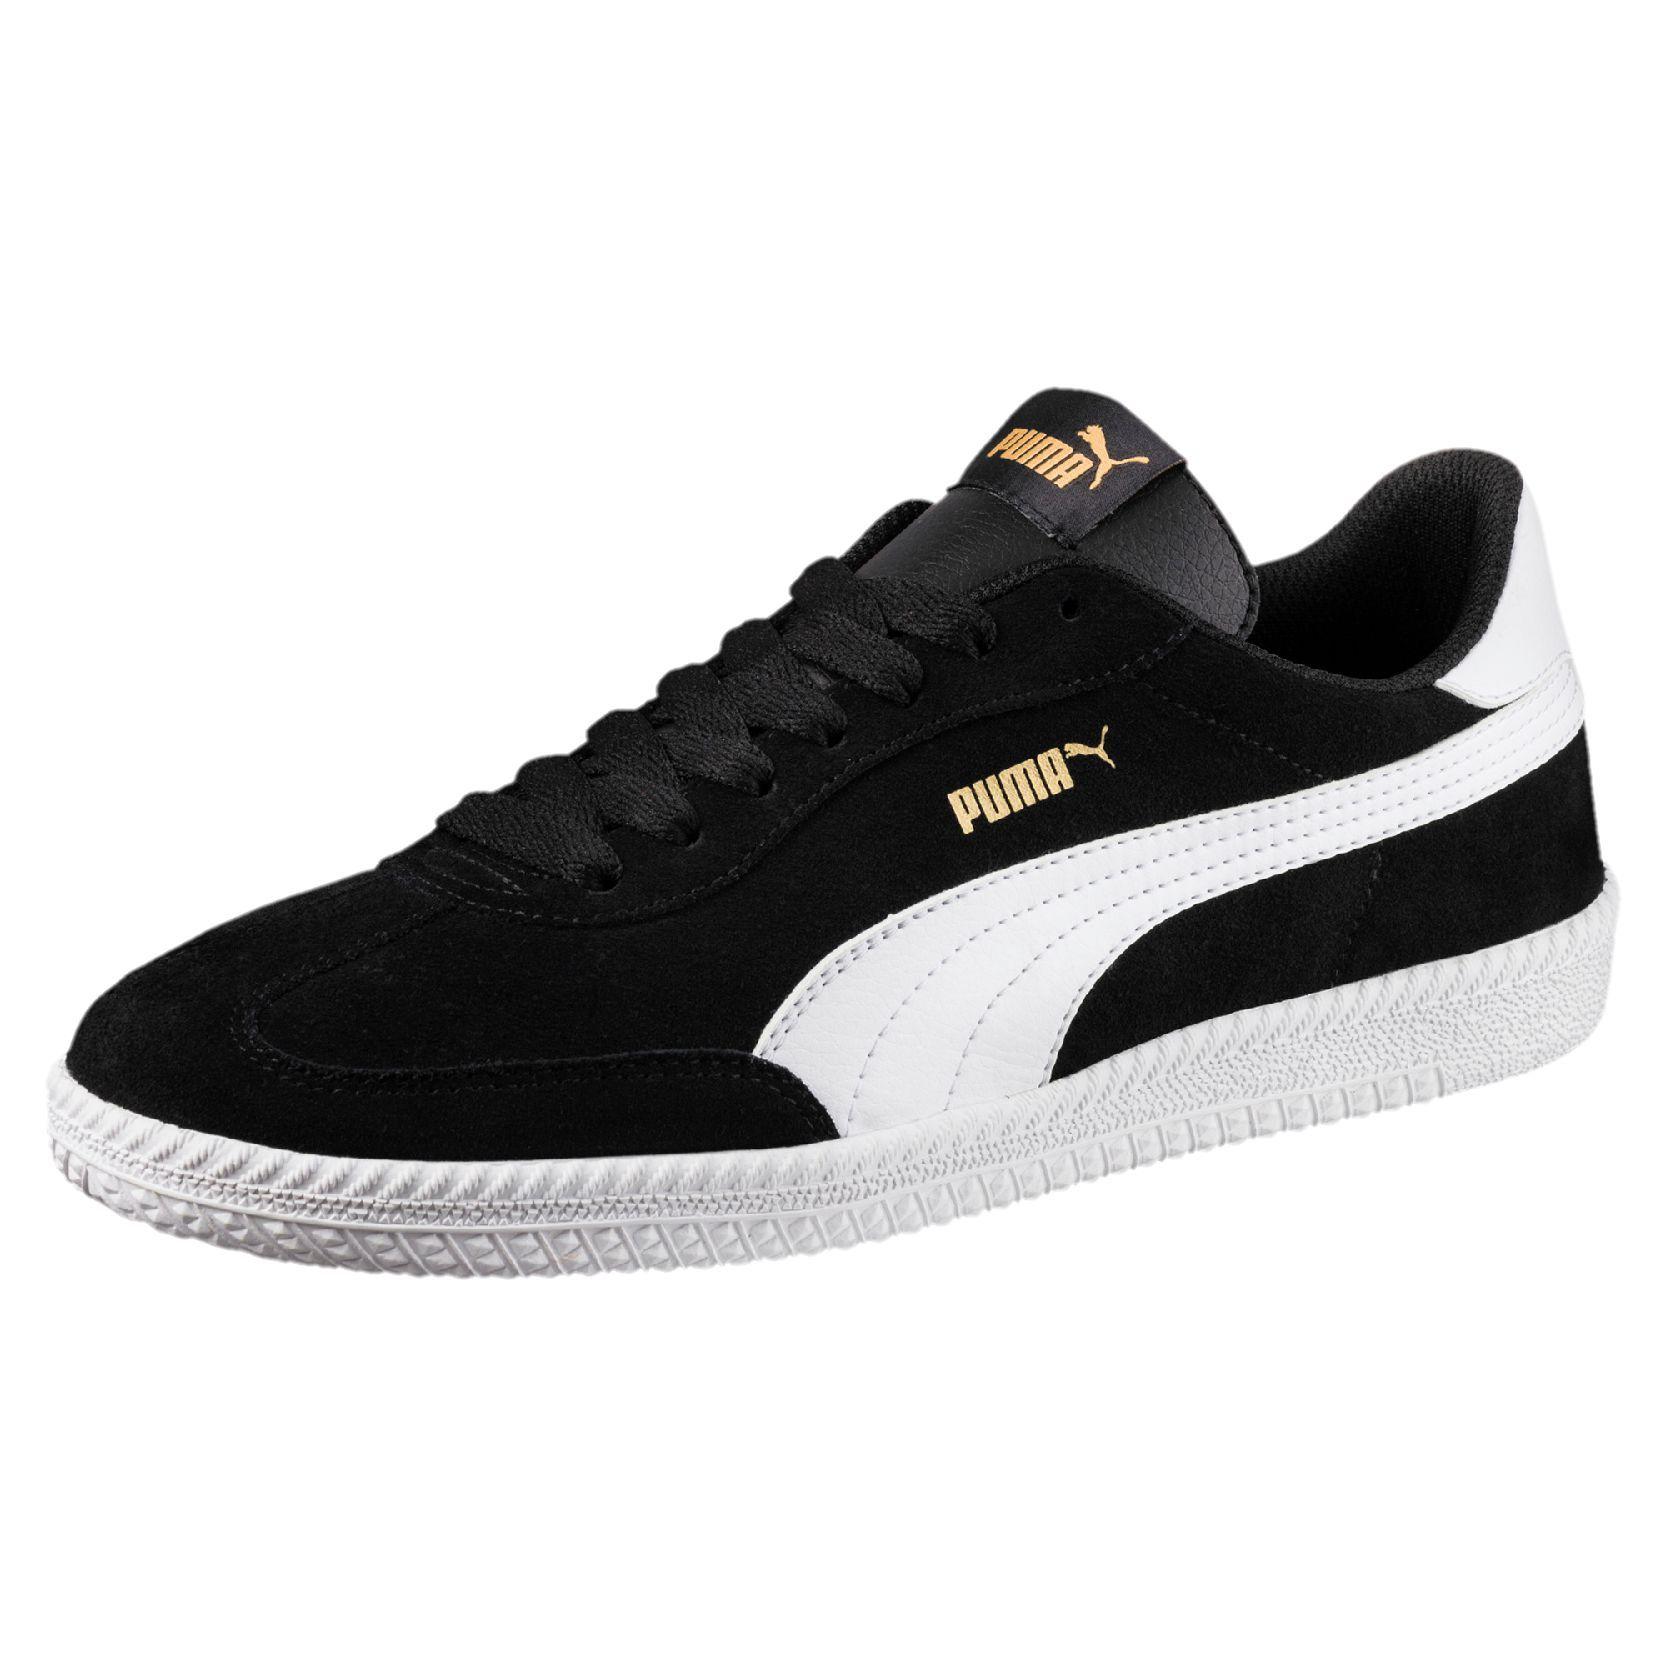 Tasse Puma Étoile L, Adulte Unisexe Zapatillas, Noir (black-puma Puma Noir), 43 I